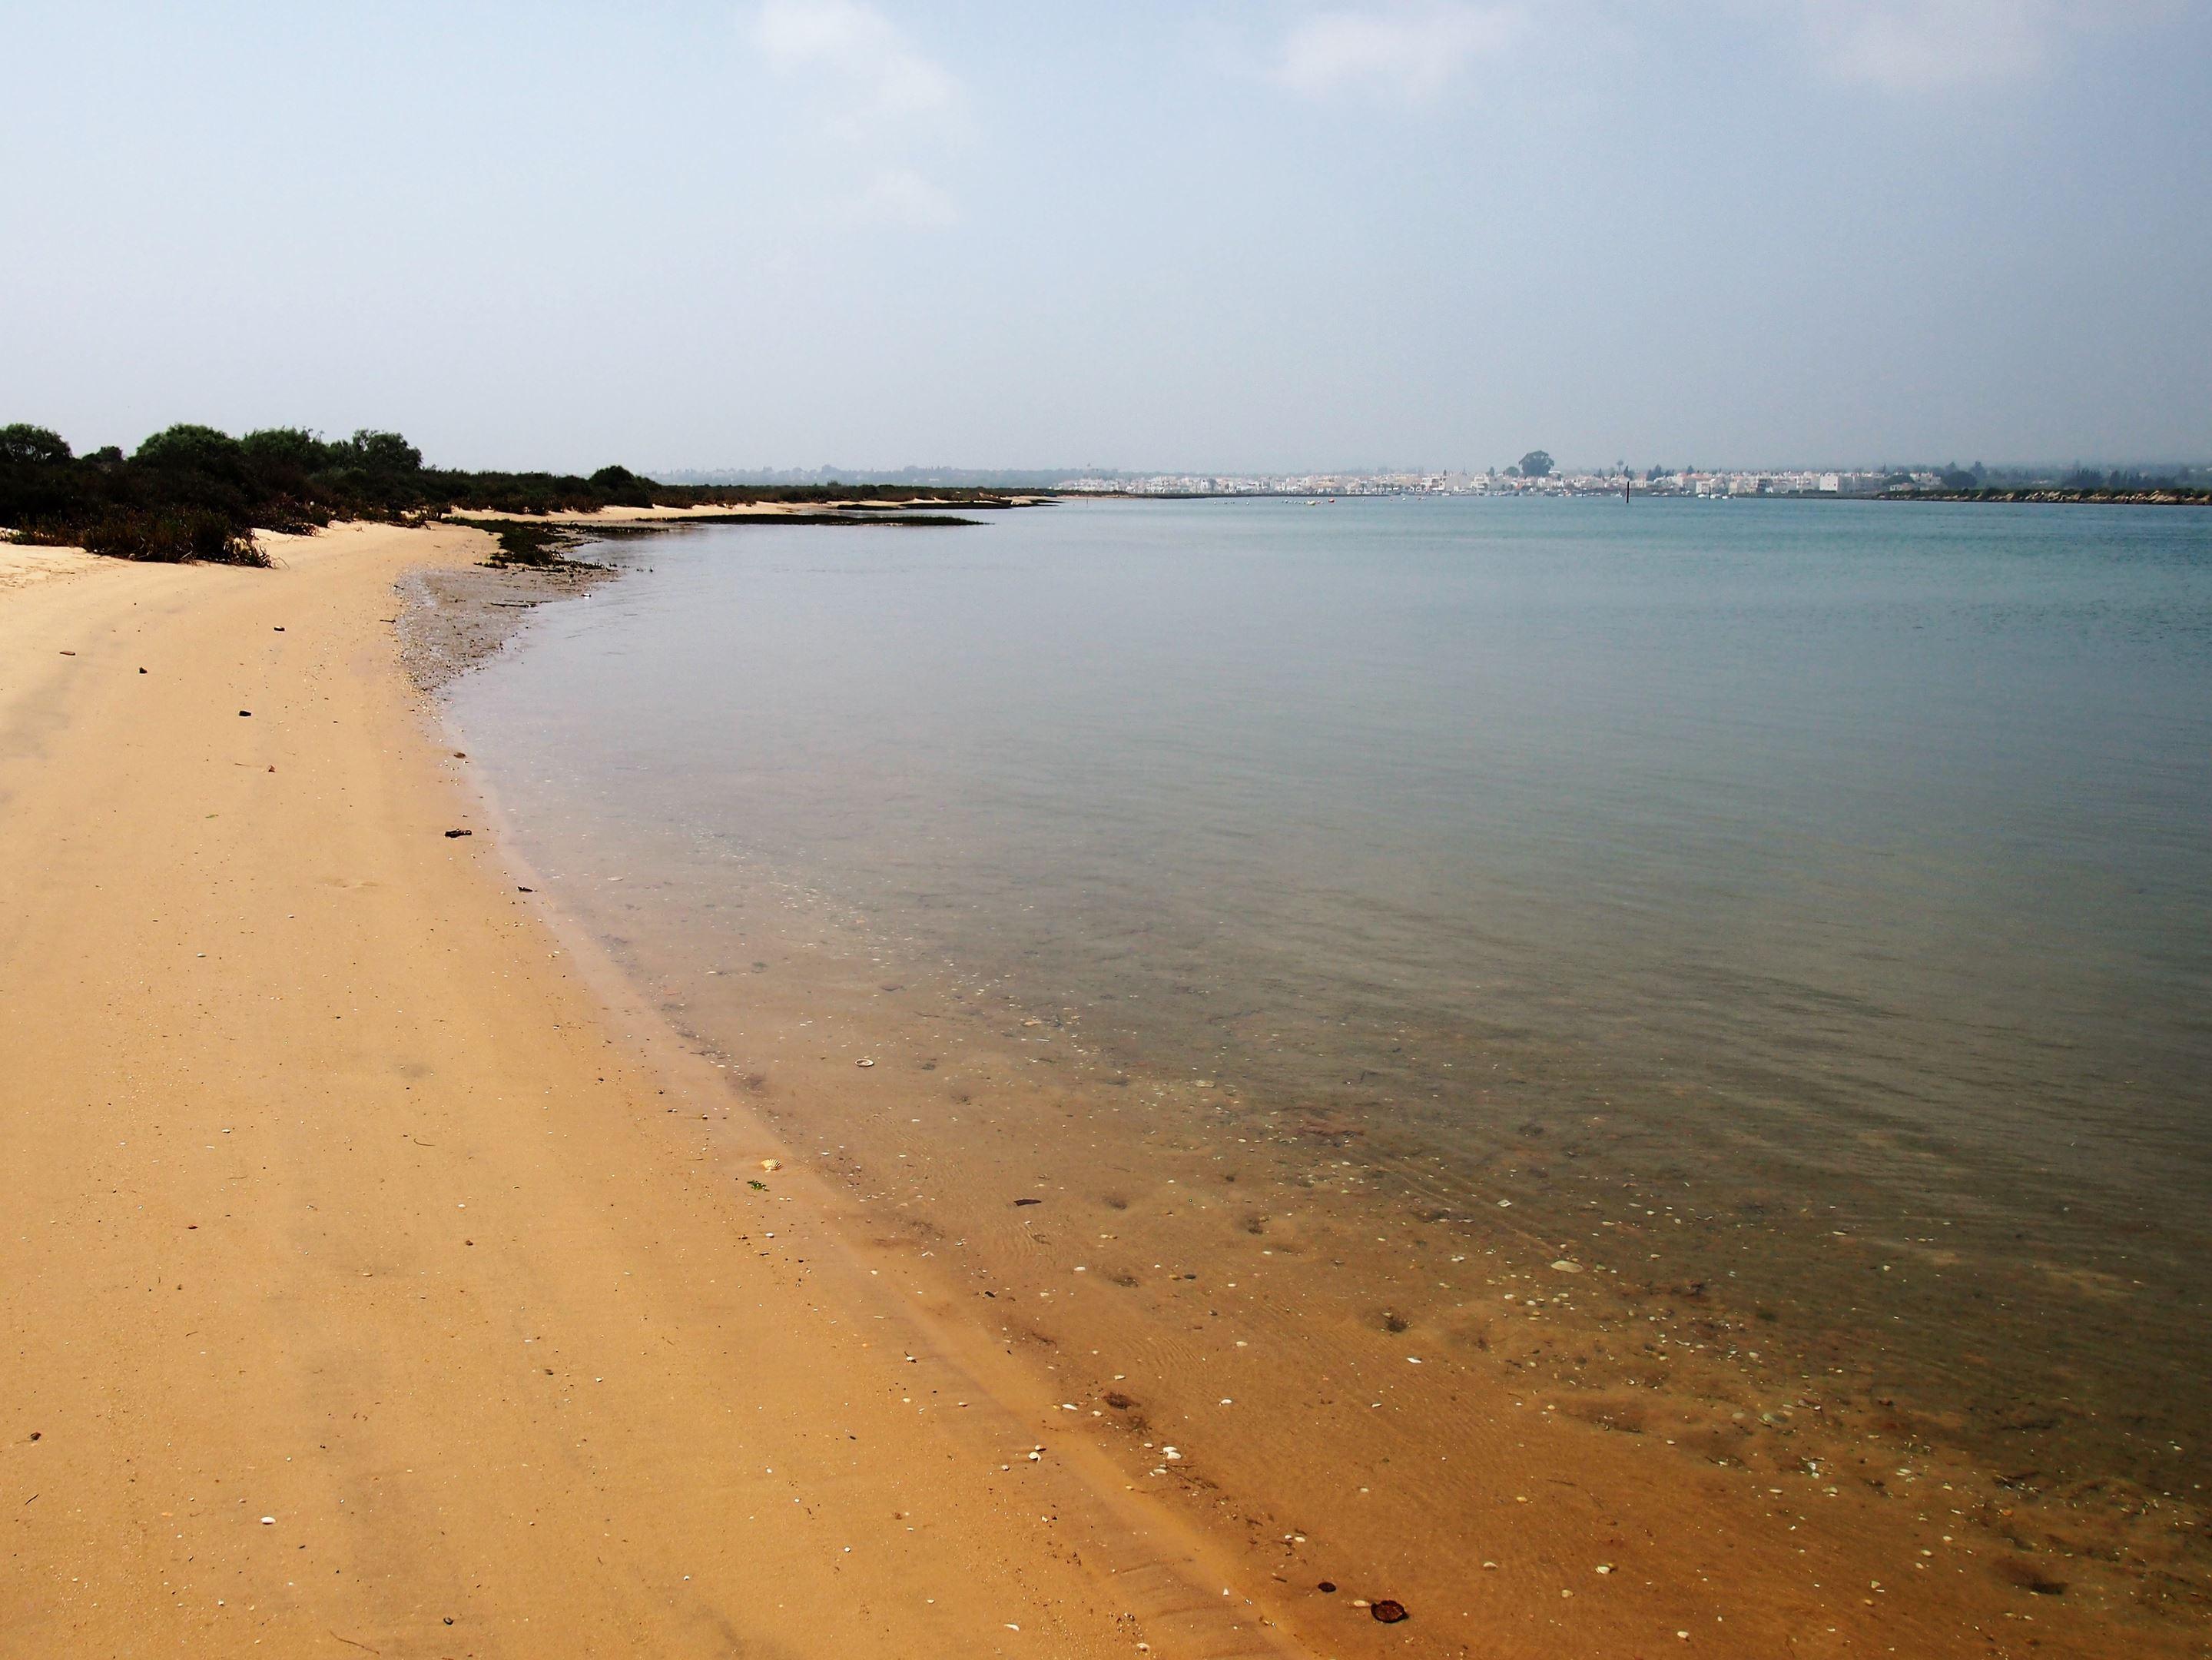 Ilha de Tavira, with Santa Luzia in the background - near Tavira